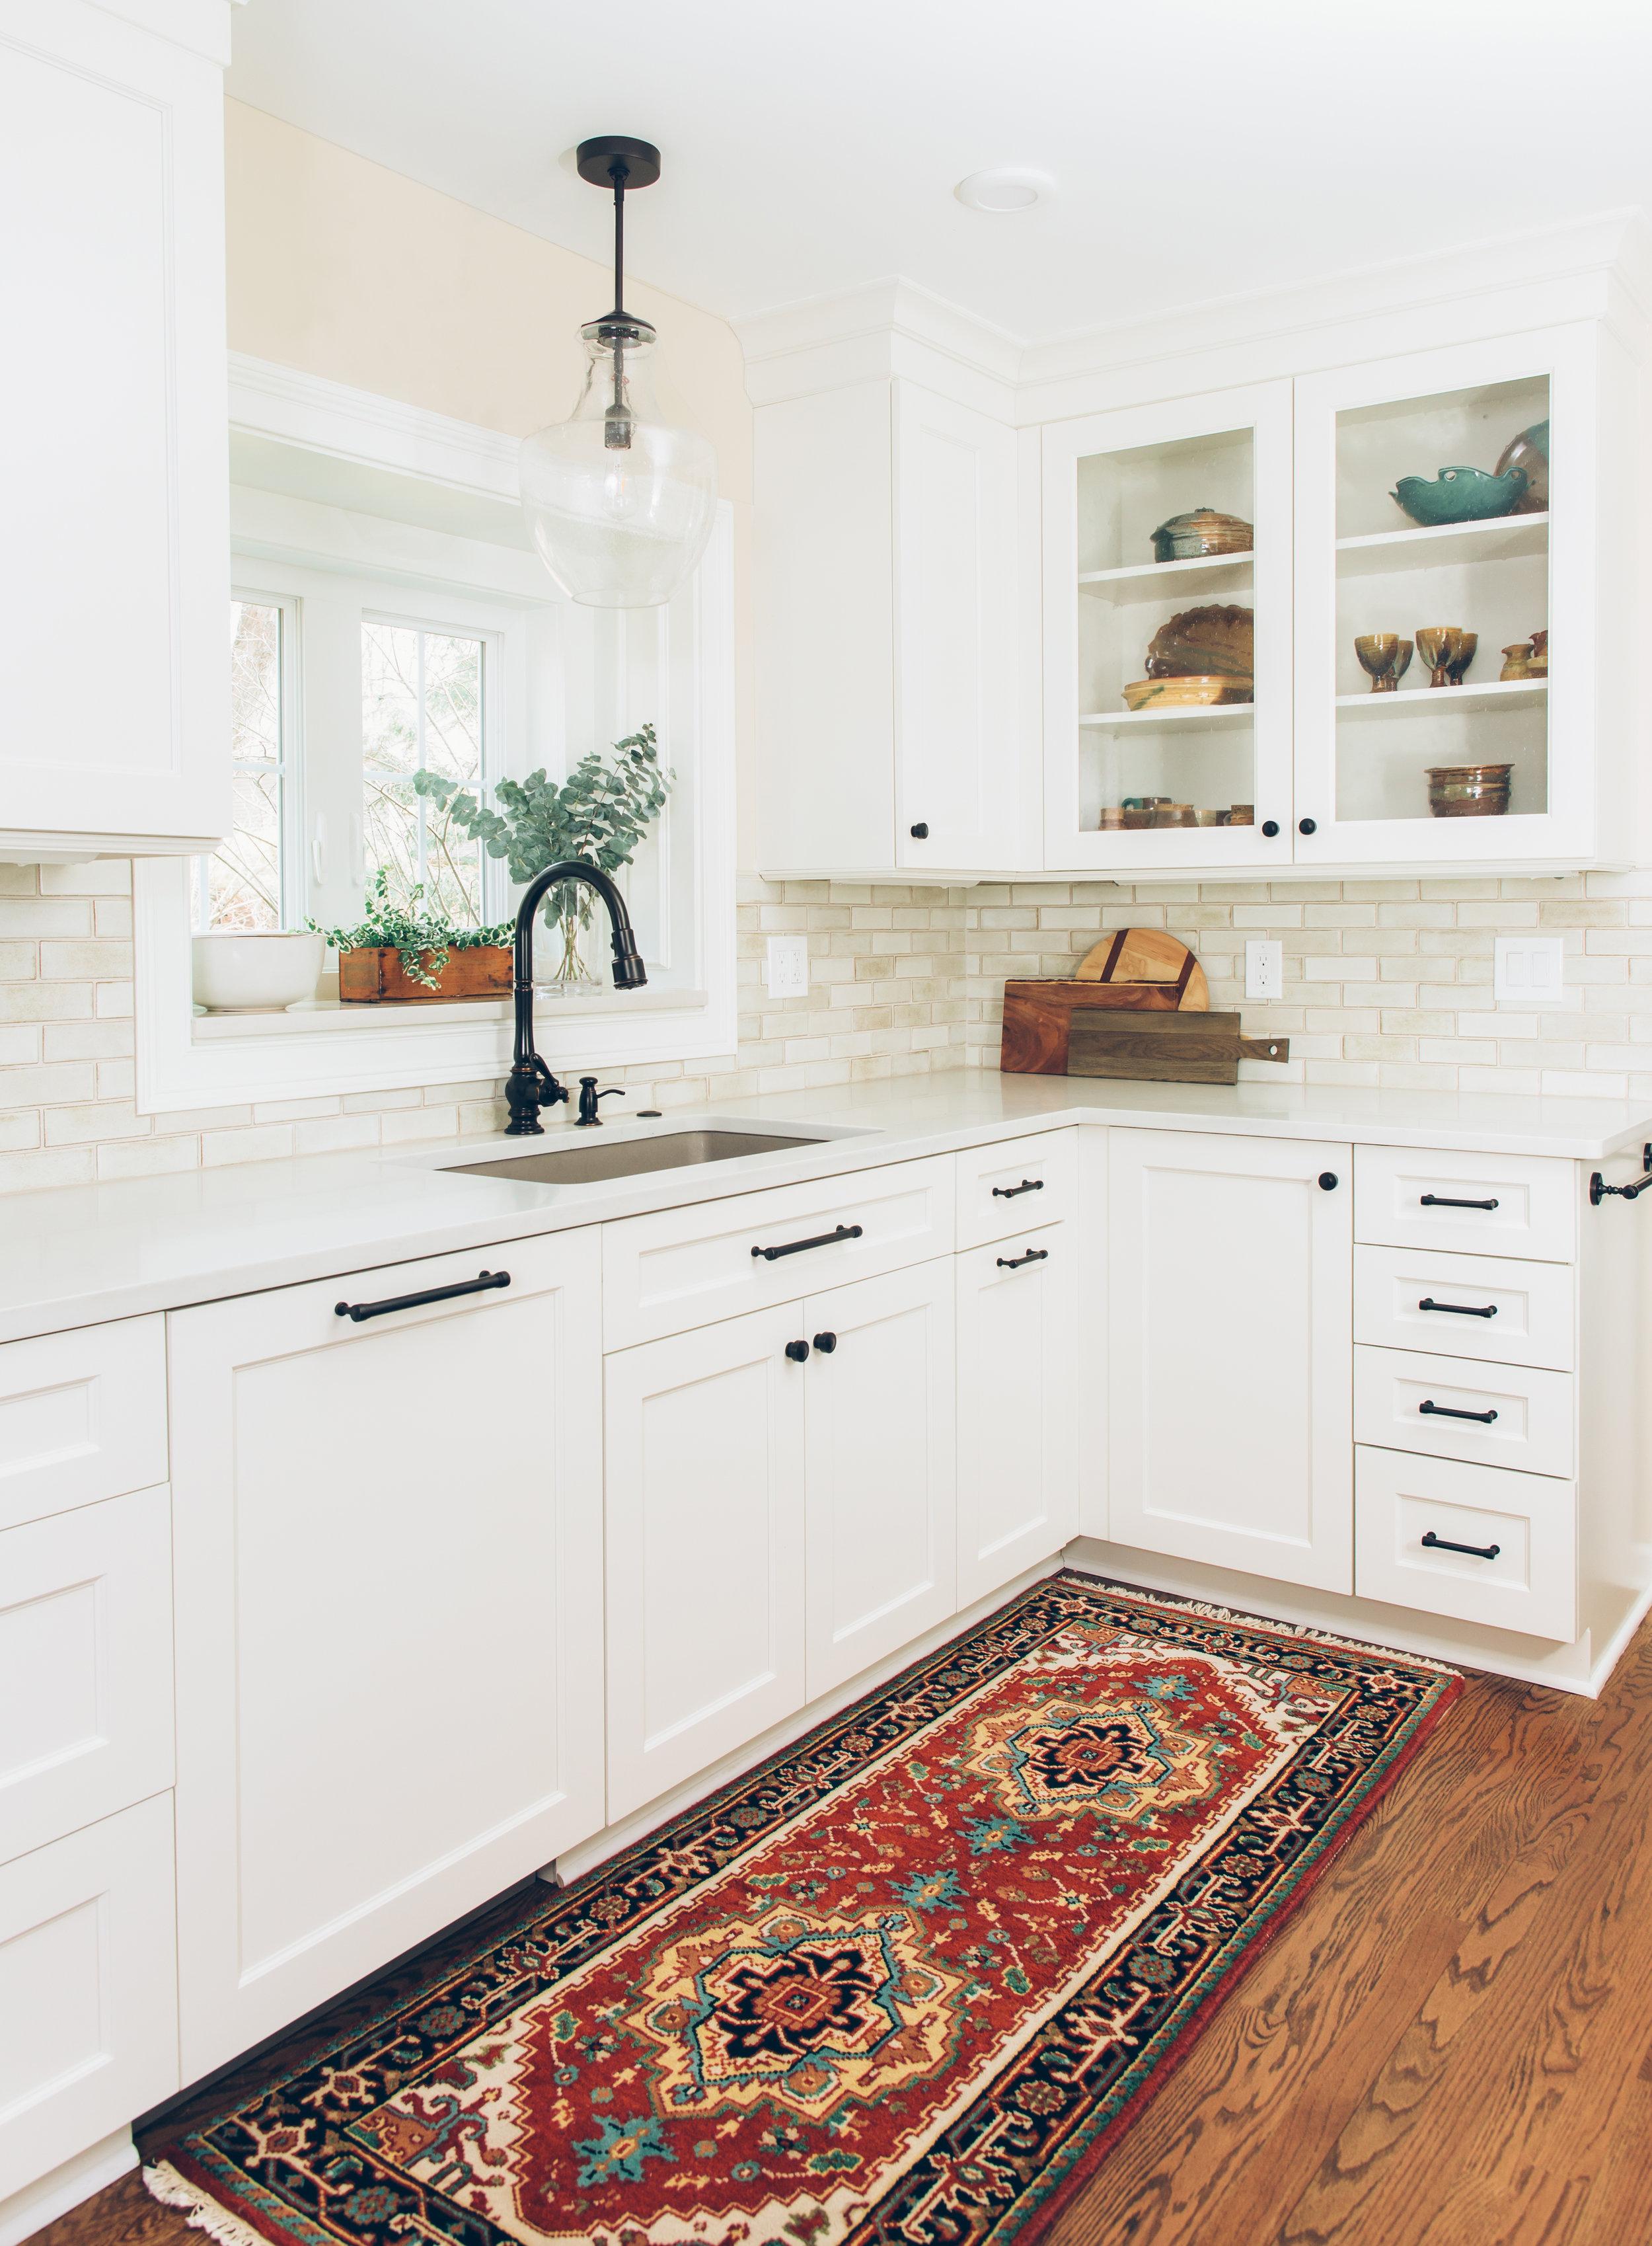 michigan-transitional-kitchen-interior-design-white